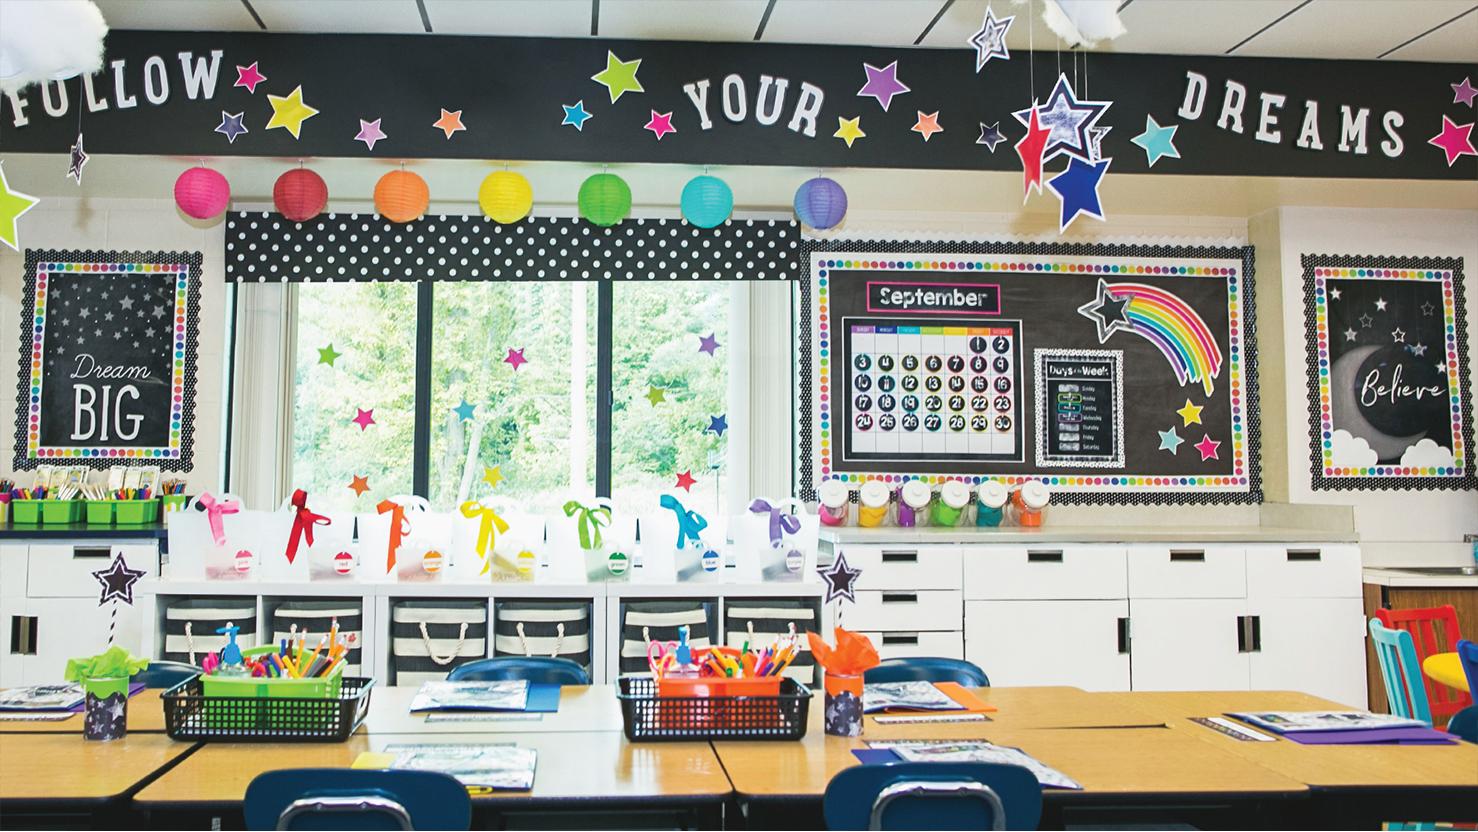 Star Classroom Theme | Star Decorations | Twinkle Twinkle ...